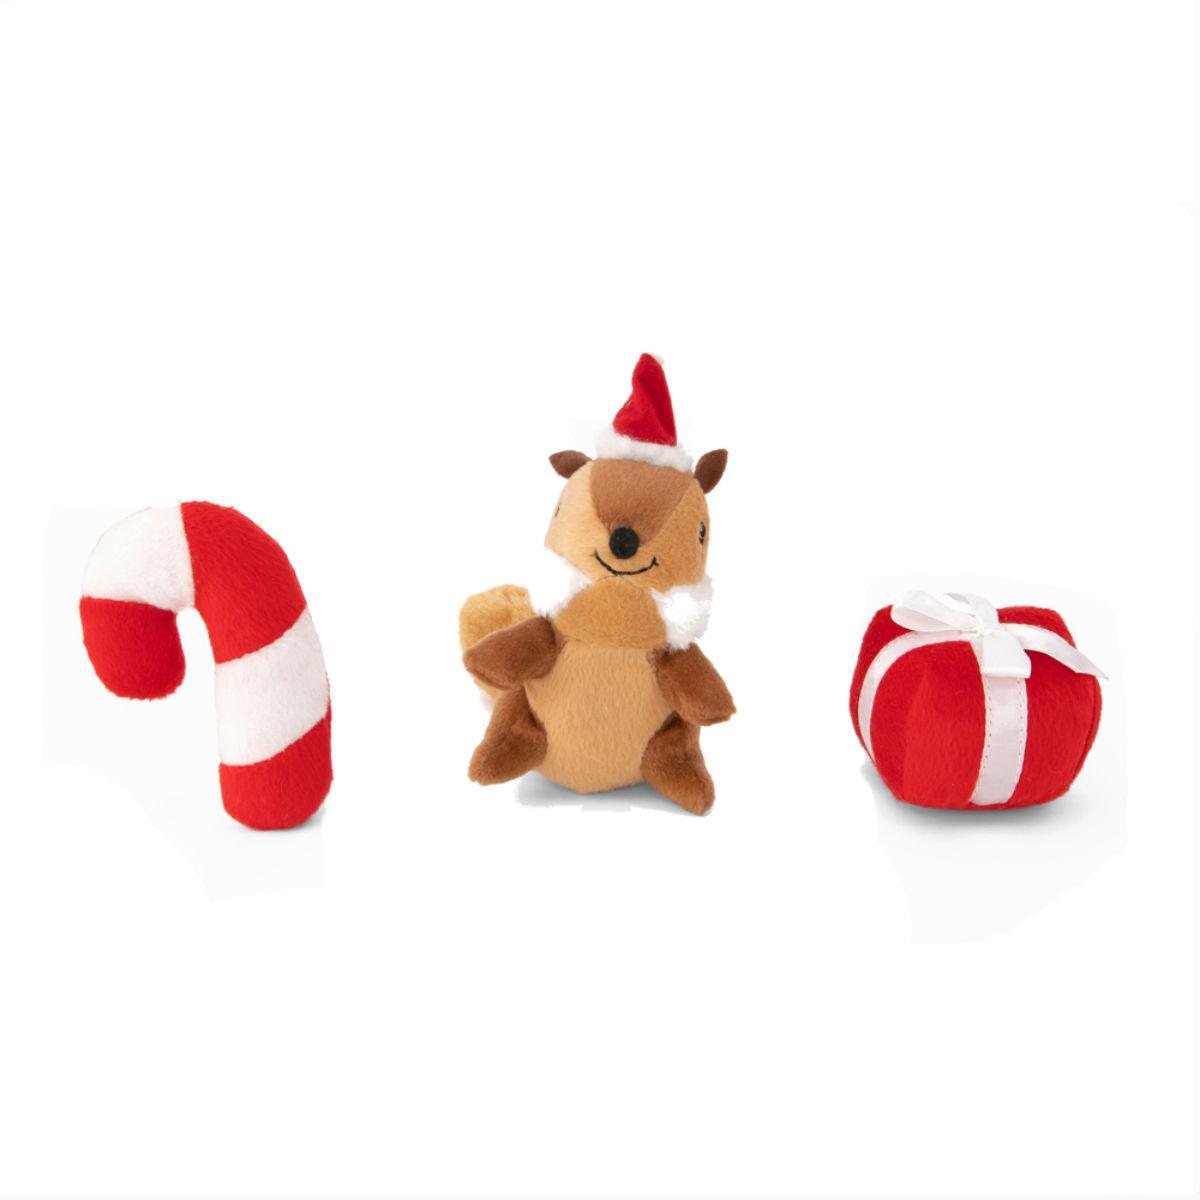 ZippyPaws Holiday Miniz Dog Toys - Festive Friends